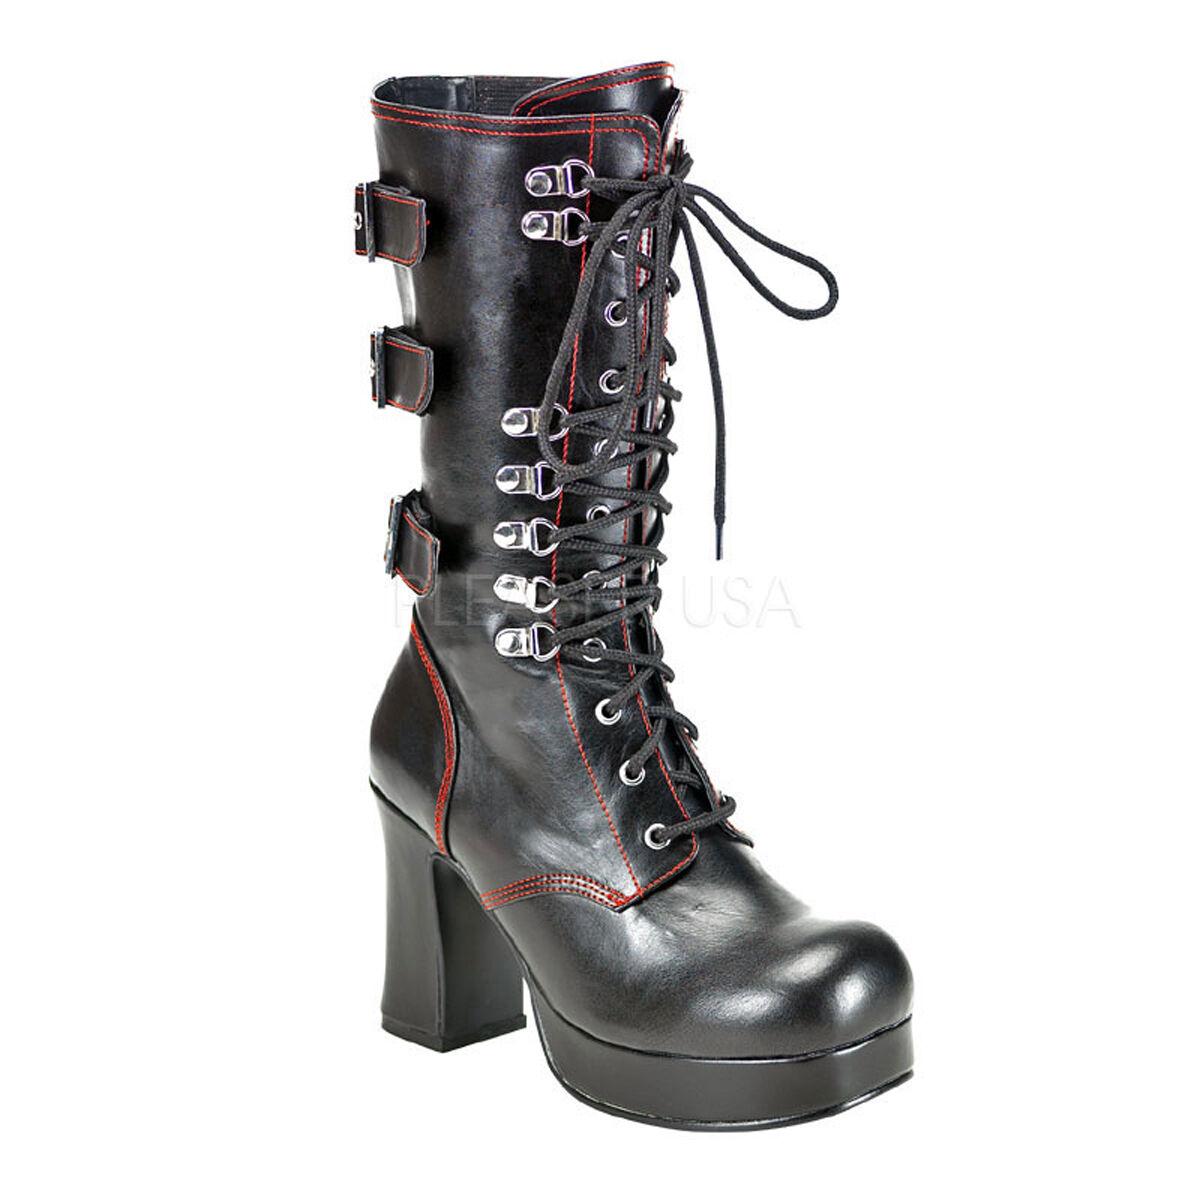 Grandes zapatos con descuento Demonia Gothika 101 Ladies Boots Buckle Strap Zip Red Black Punk Boots